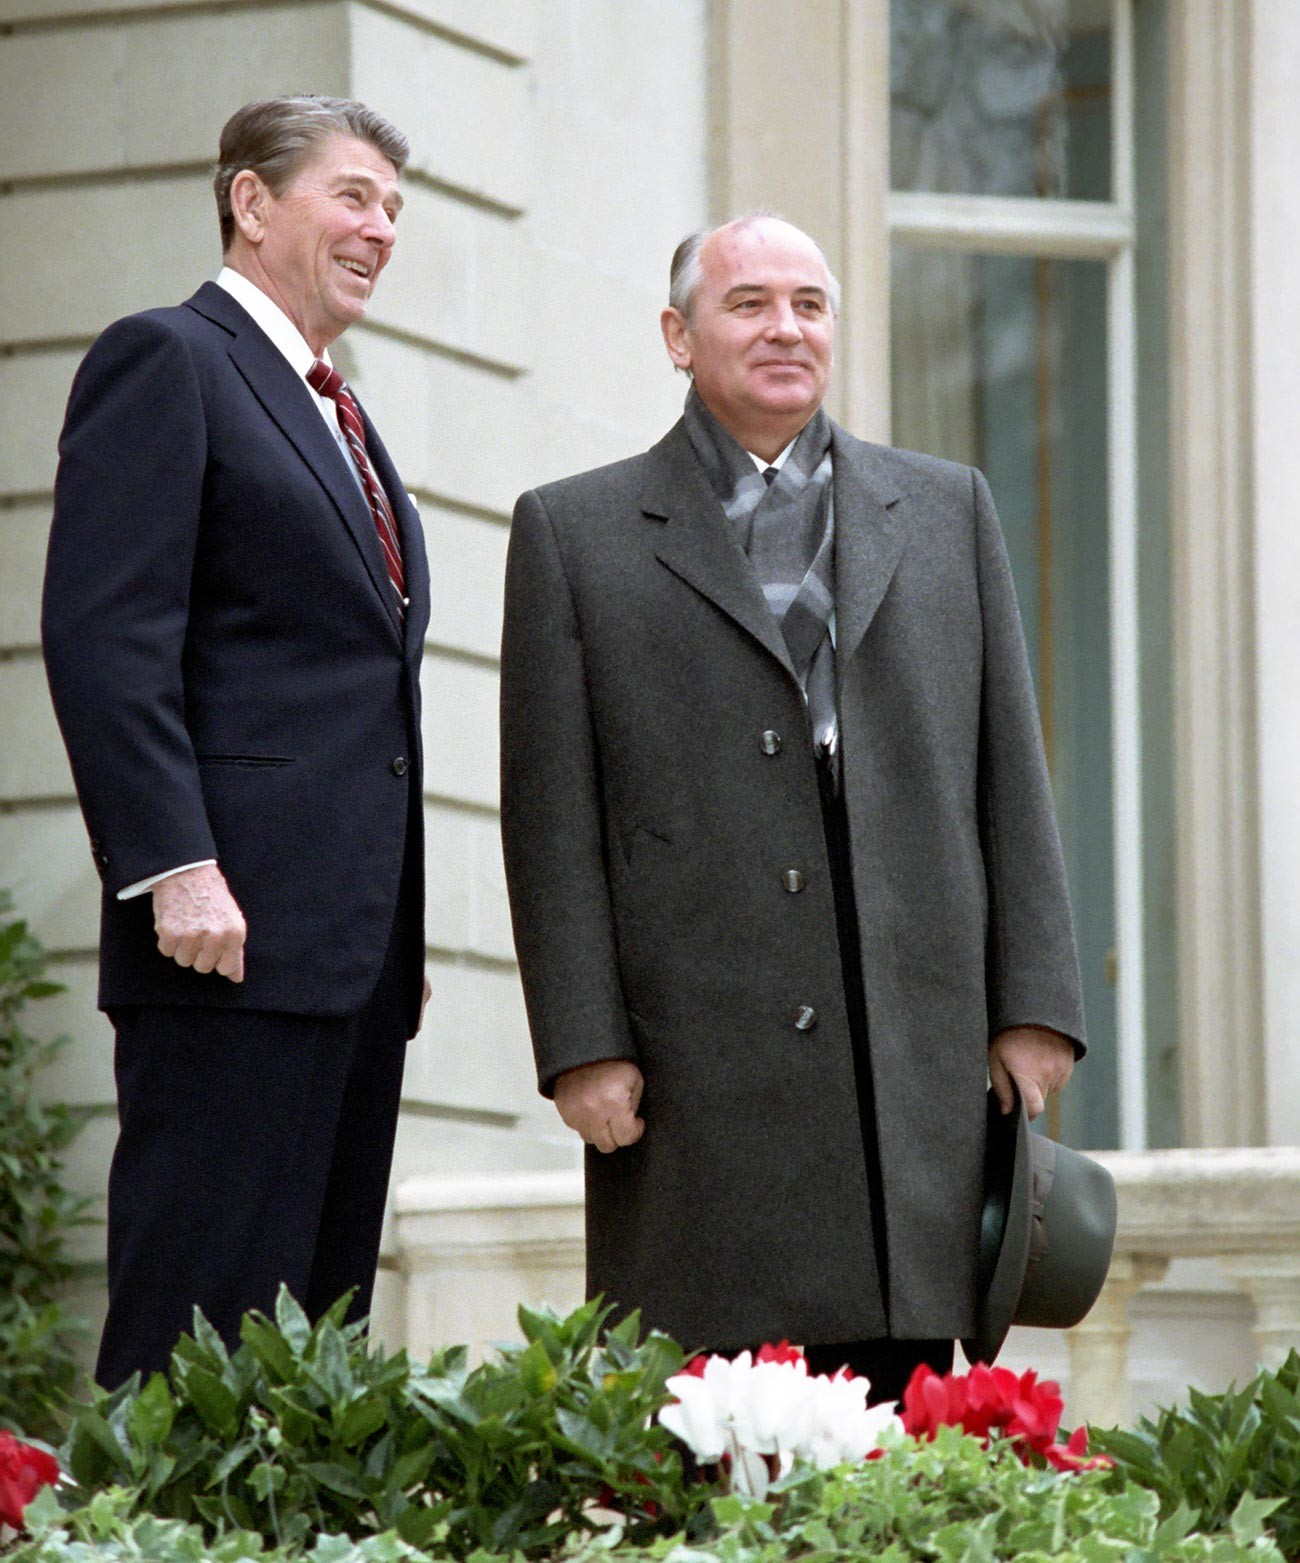 Soviet leader Mikhail Gorbachev and U.S. President Ronald Reagan at the Geneva Summit 1985.